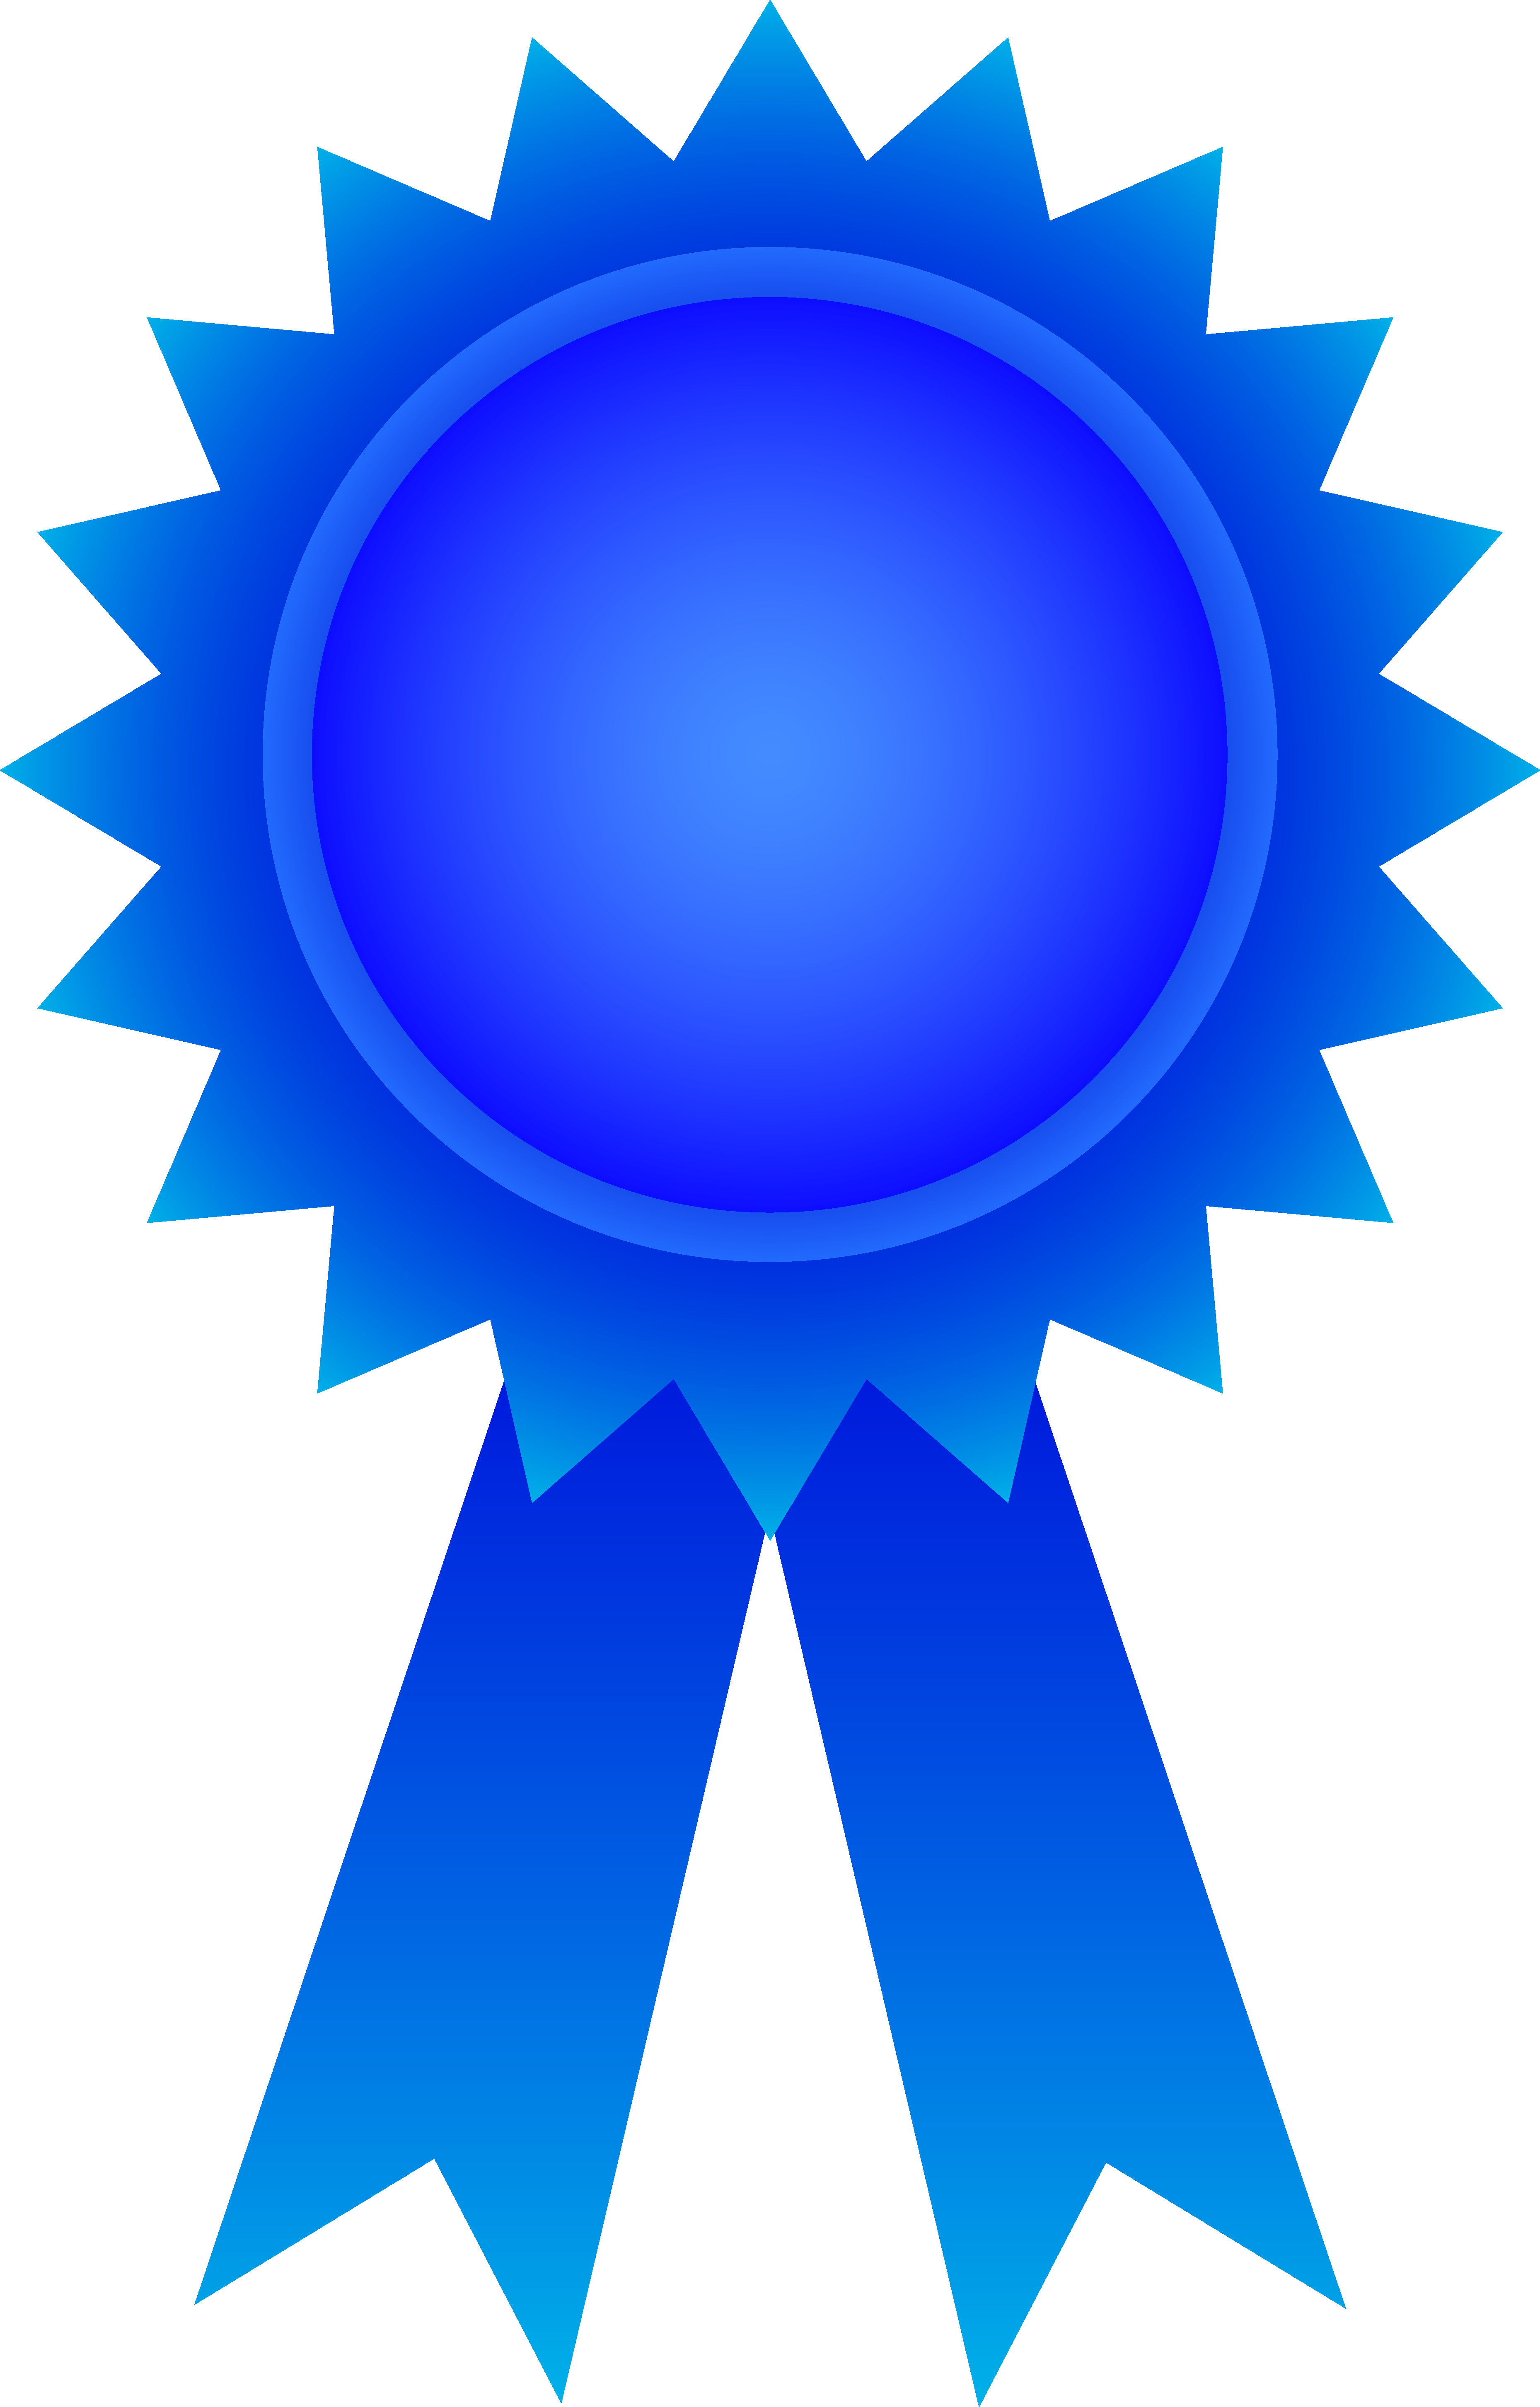 st place ribbon. Awards clipart printable